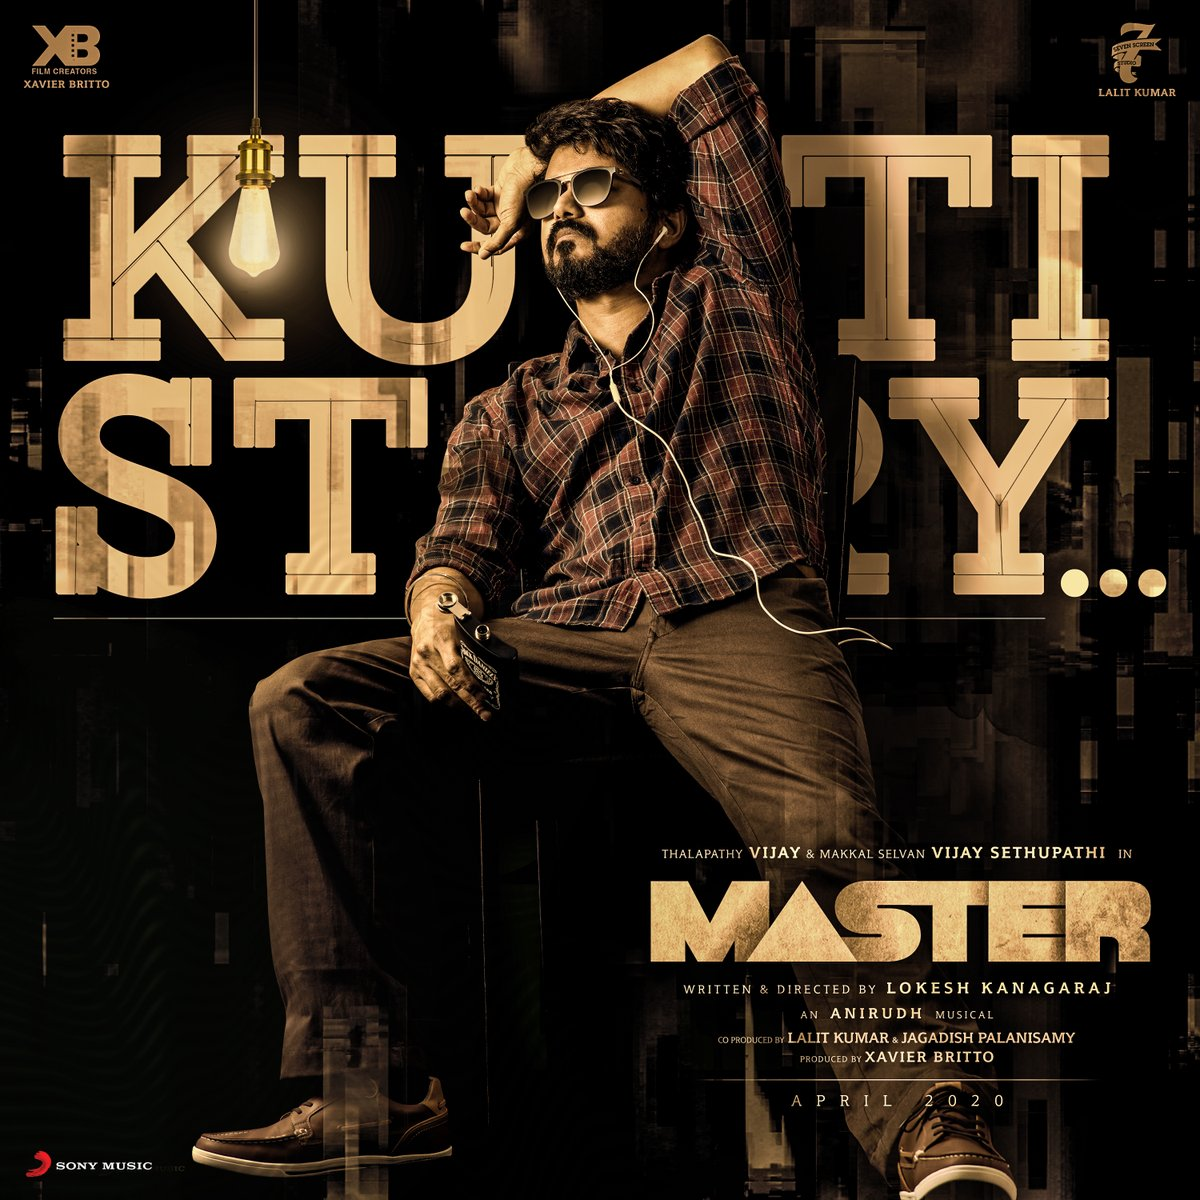 Life is a #KuttiStory, Nanba! So, stream this track now  @Sonymusicsouth @actorvijay @VijaySethuOffl @Dir_Lokesh @XBFilmCreators @anirudhofficial @Jagadishbliss @MalavikaM_ @imKBRshanthnu